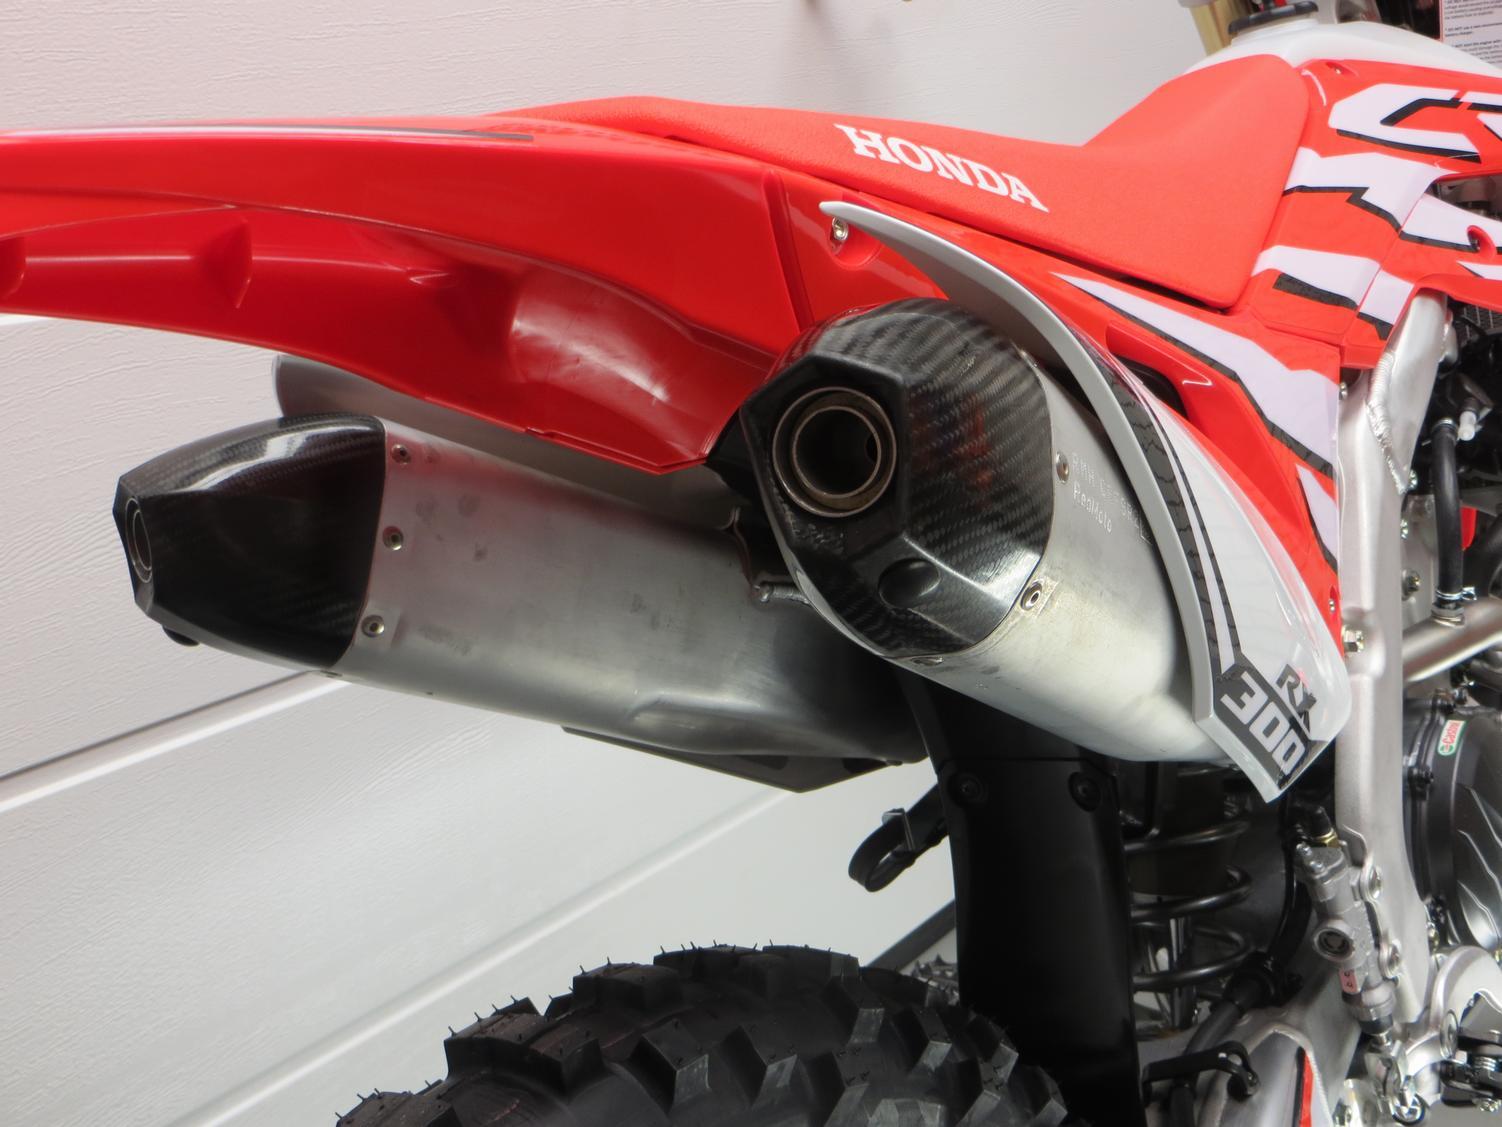 HONDA - CRF 250 RXK ENDURO